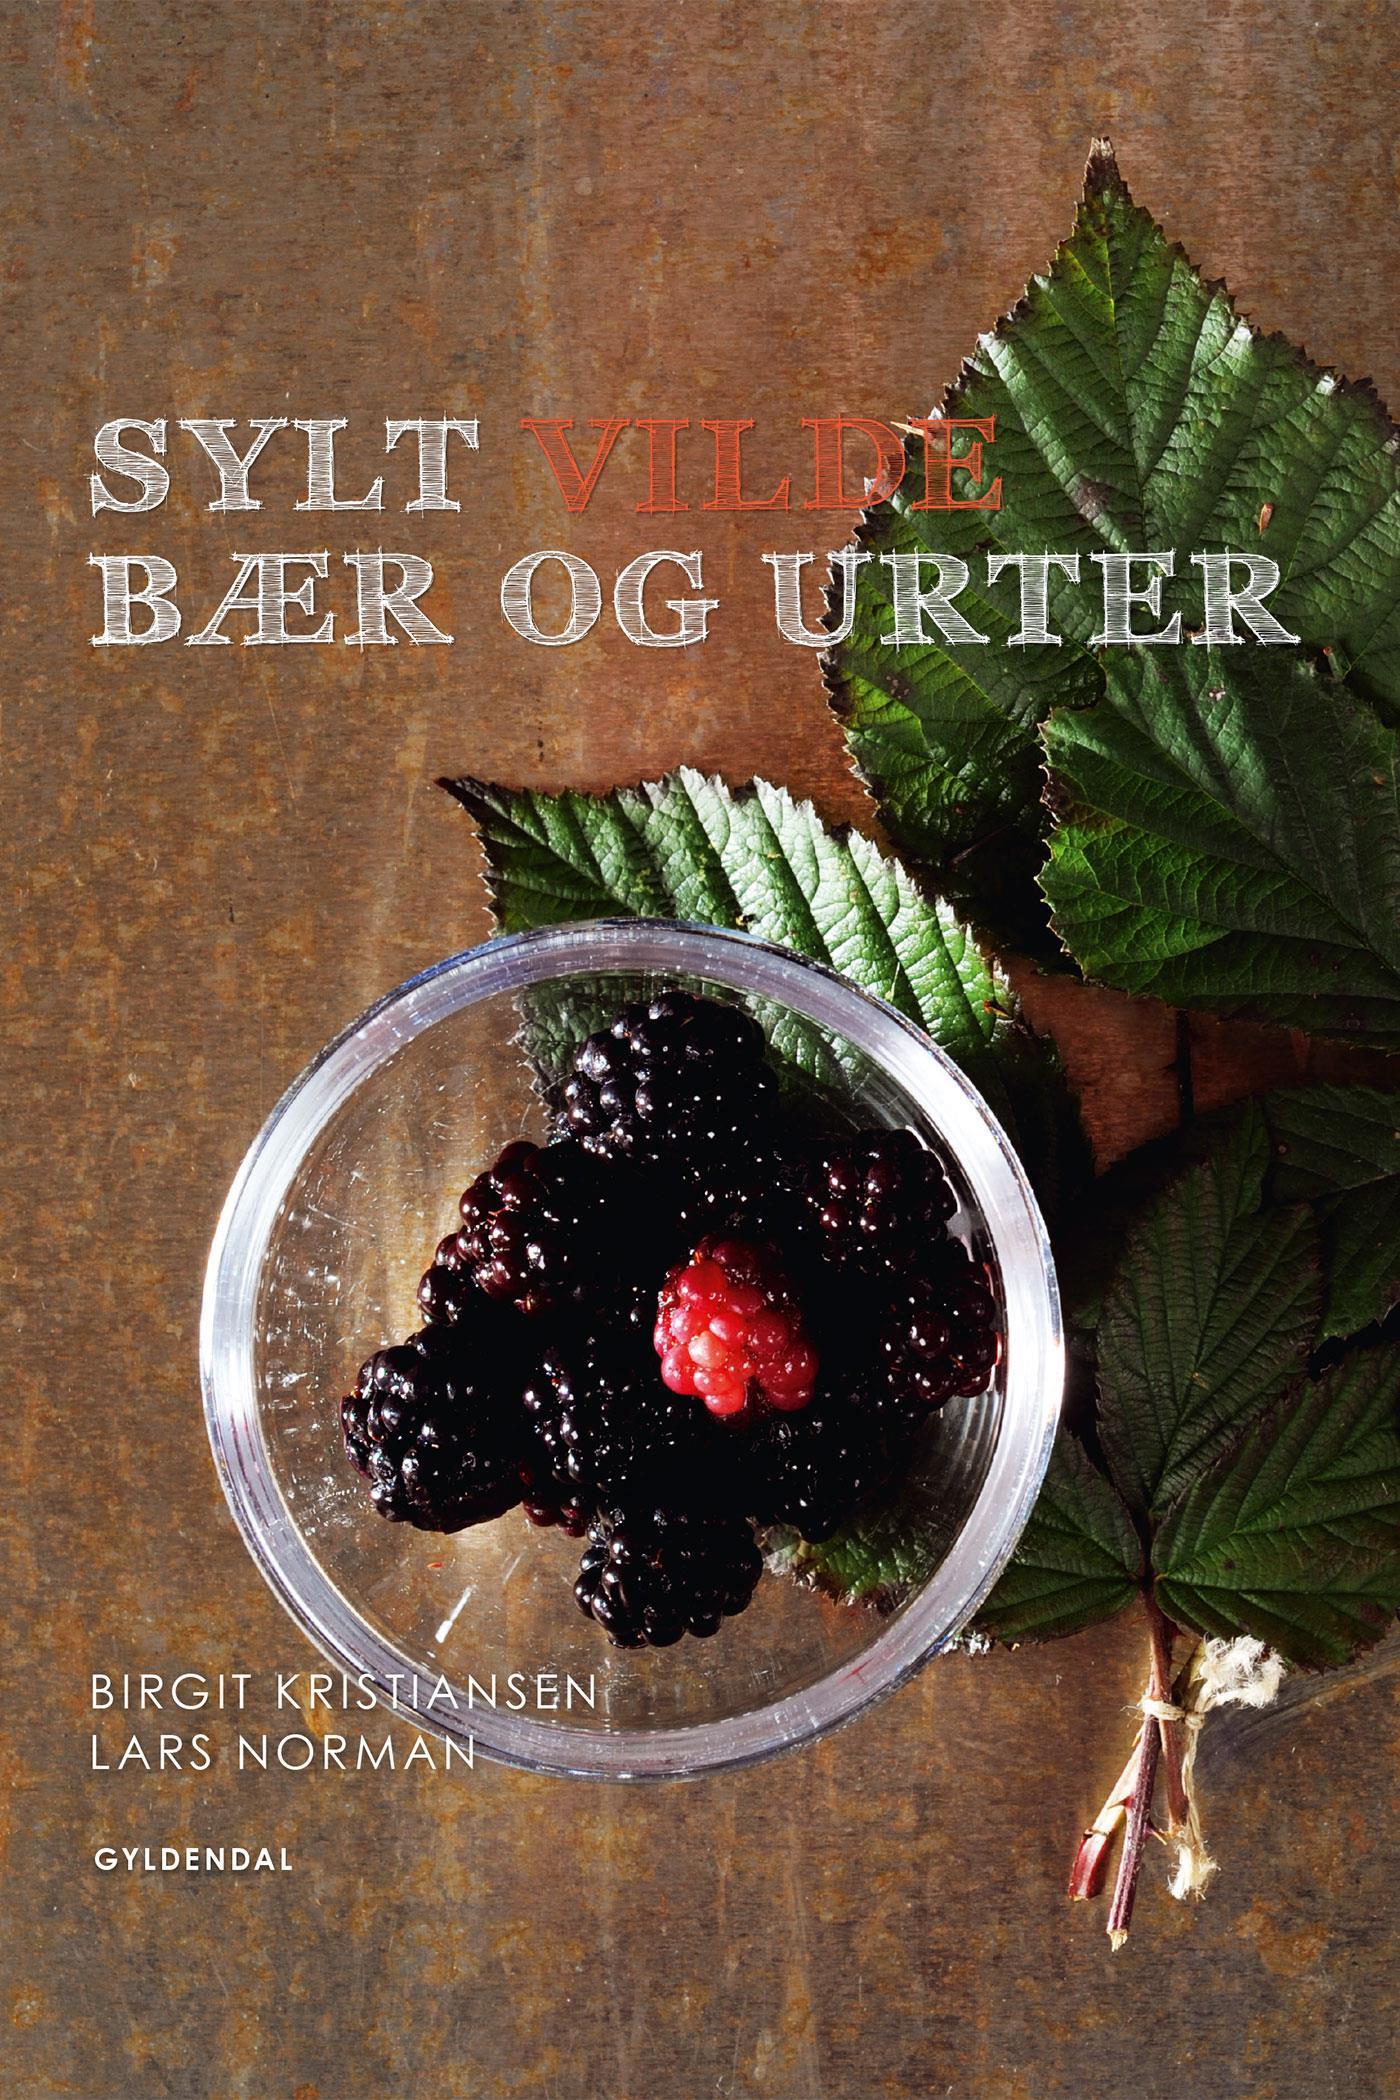 Sylt vilde bær og urter - e-bog fra N/A fra bog & mystik